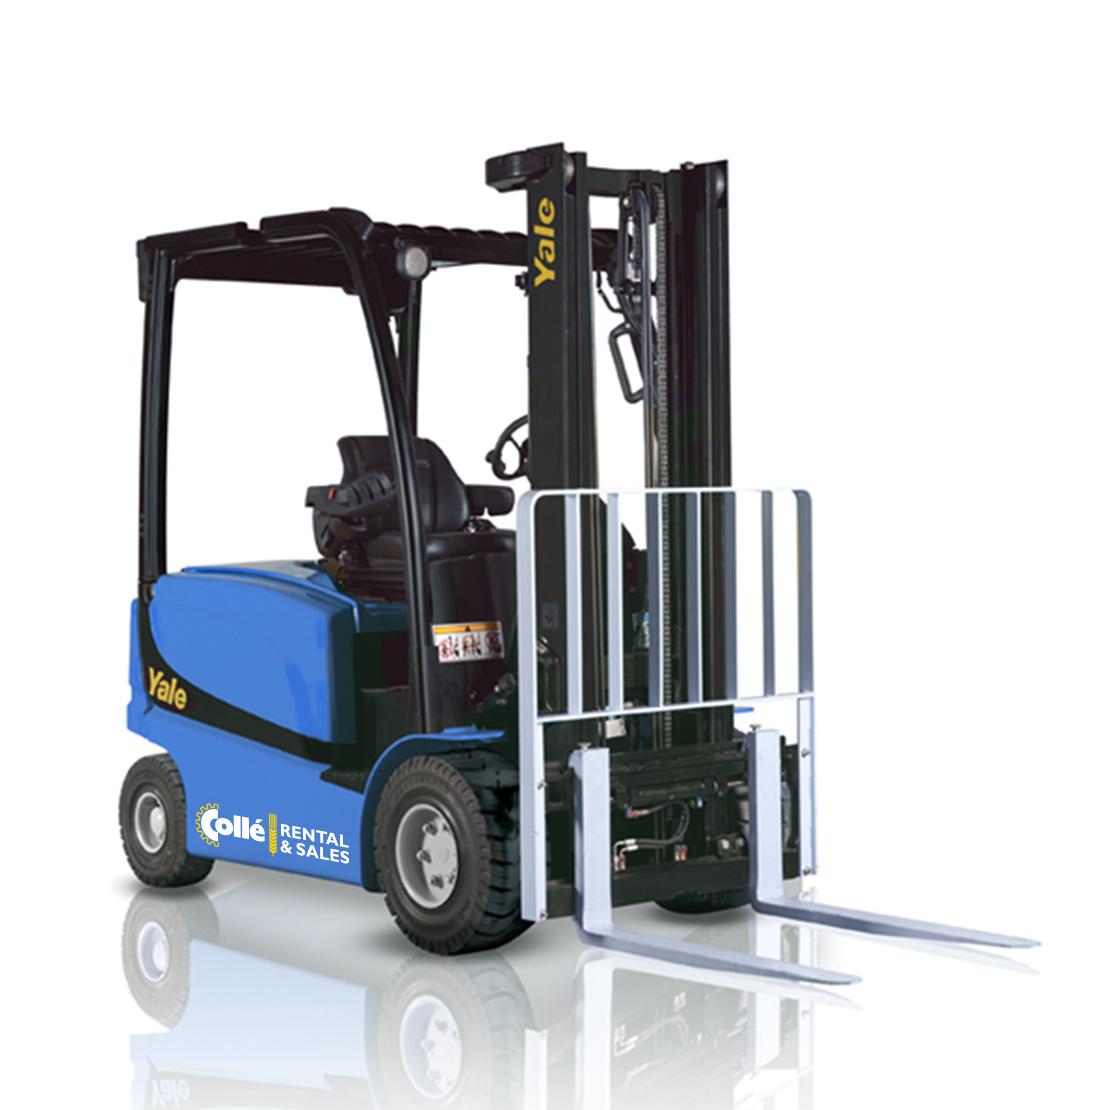 Forklift 1,5 ton Electric - Collé Rental & Sales